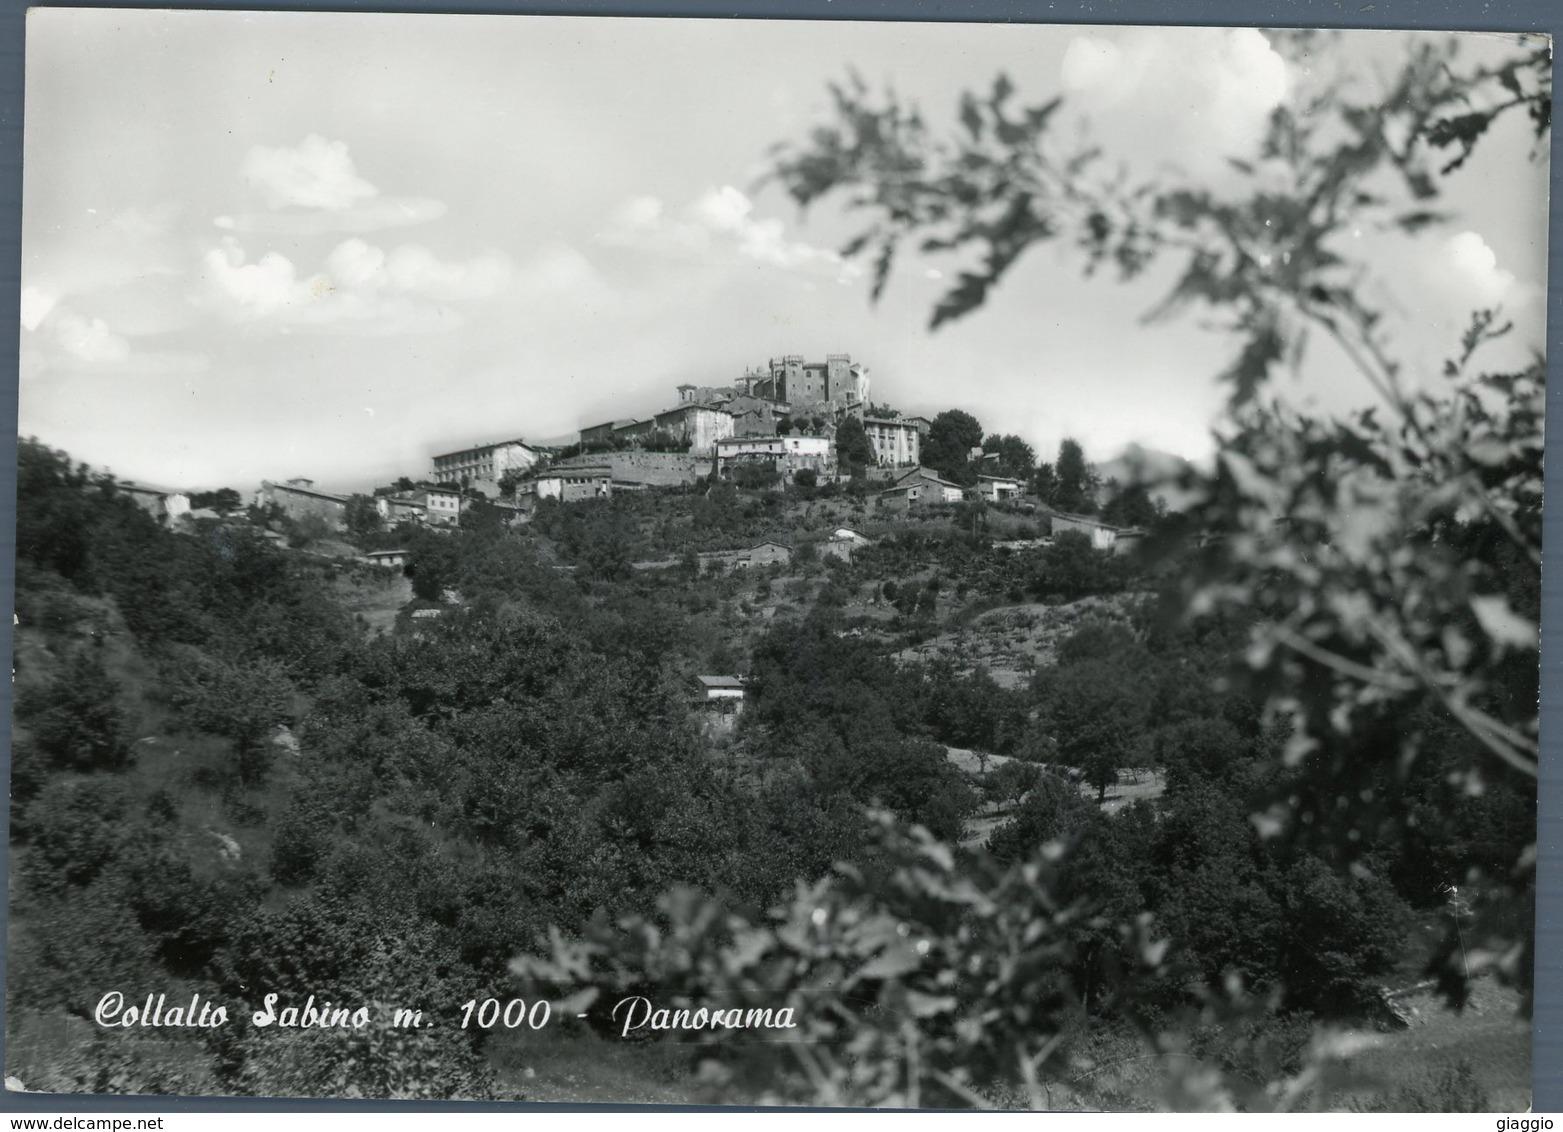 °°° Cartolina N. 76 Collalto Sabino Panorama Nuova °°° - Rieti